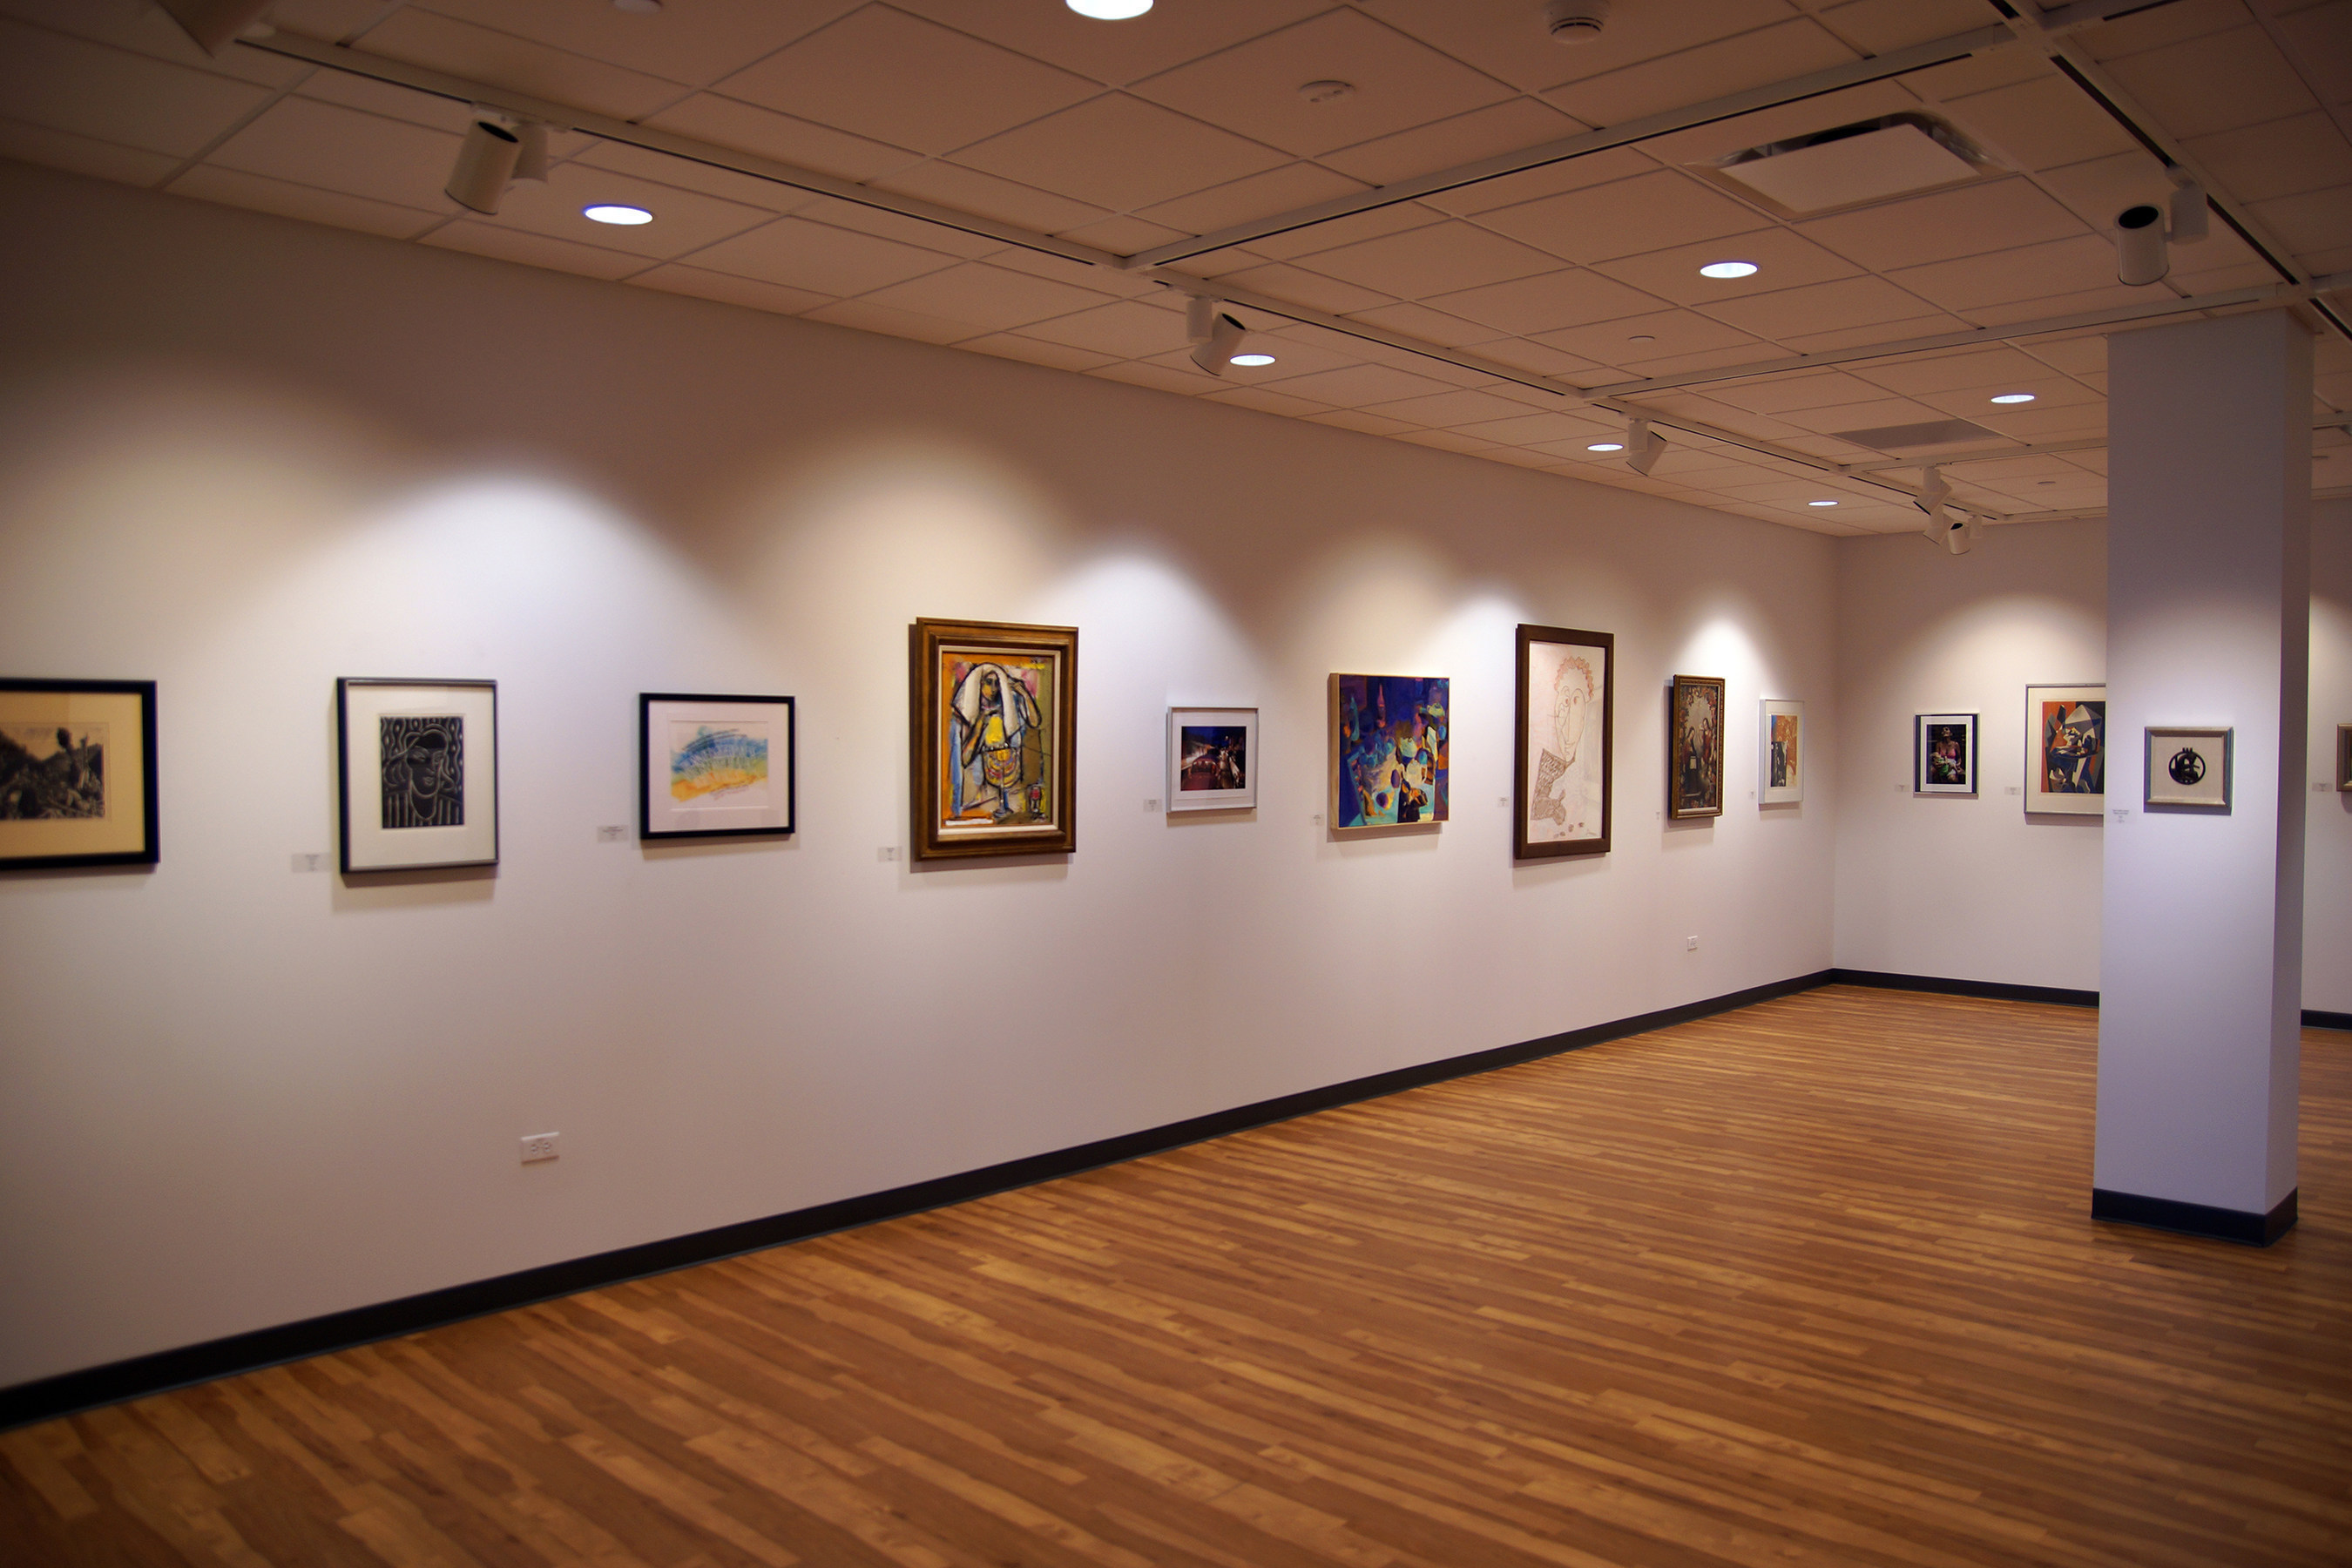 Artwork is displayed in the Fr. Michael E. Komechak, O.S.B., Art Gallery at Benedictine University. (PRNewsFoto/Benedictine University)